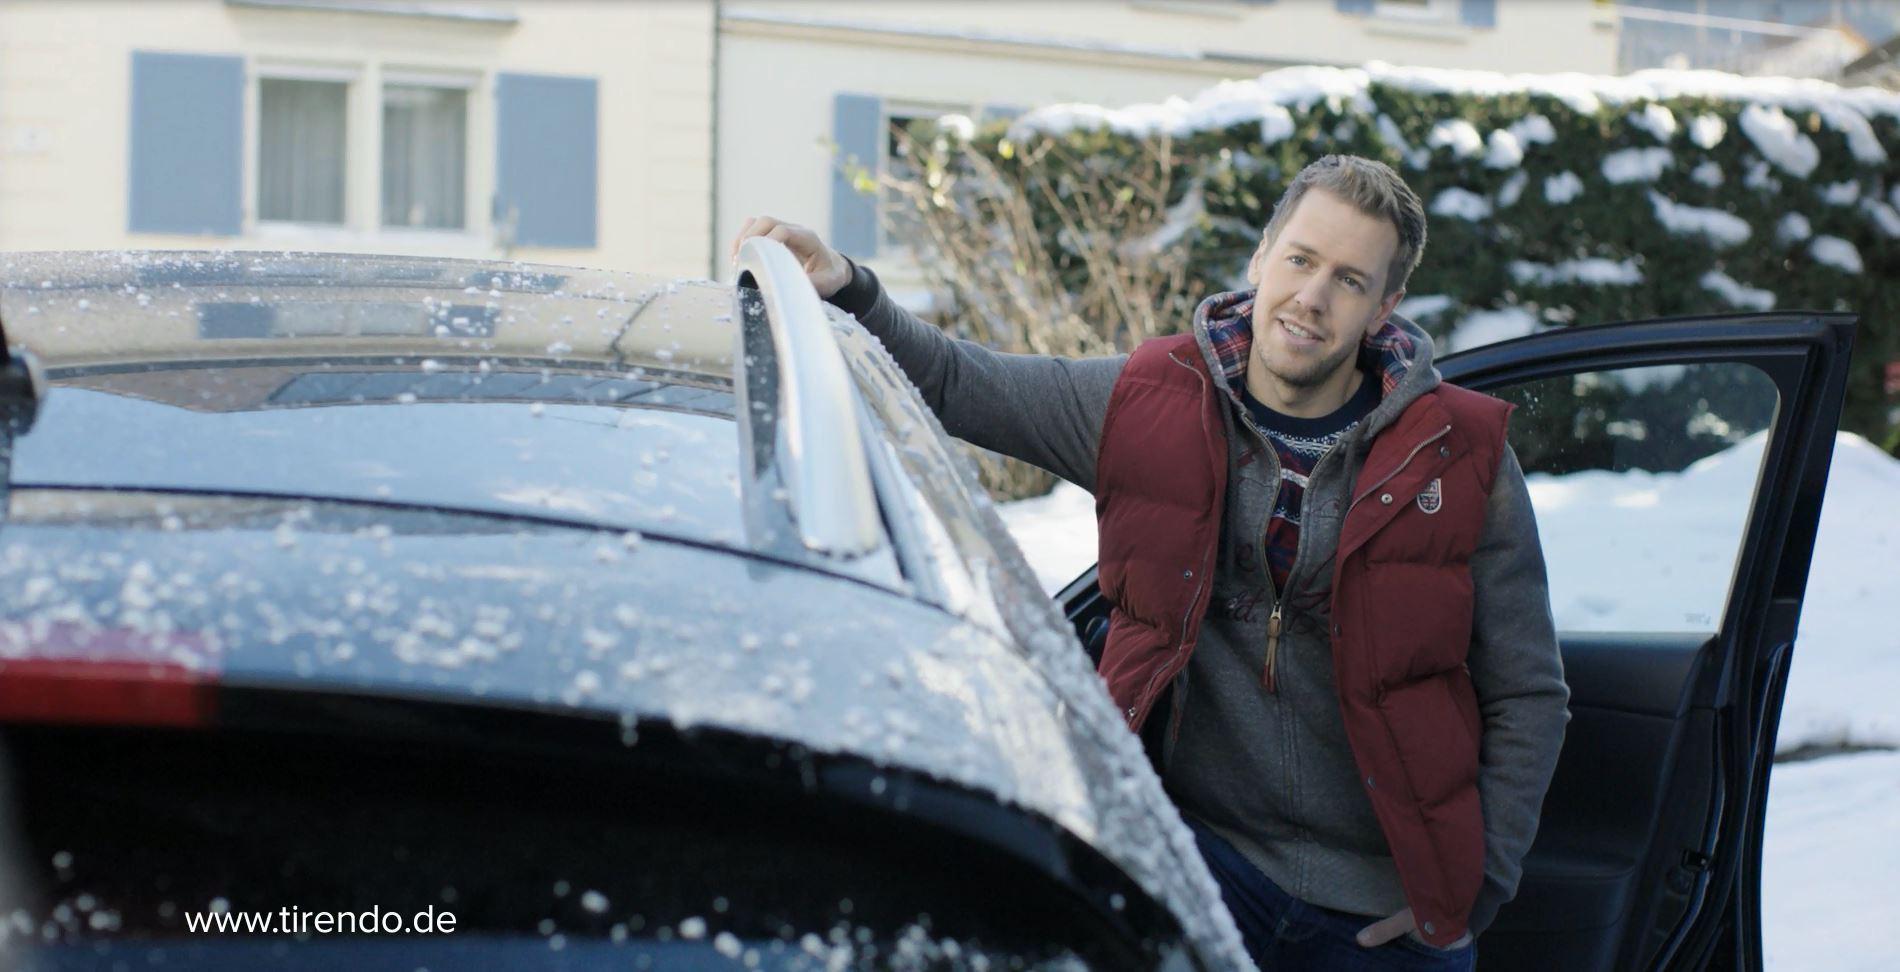 Online tire dealer Tirendo starts winter season 2014 with new TV ...